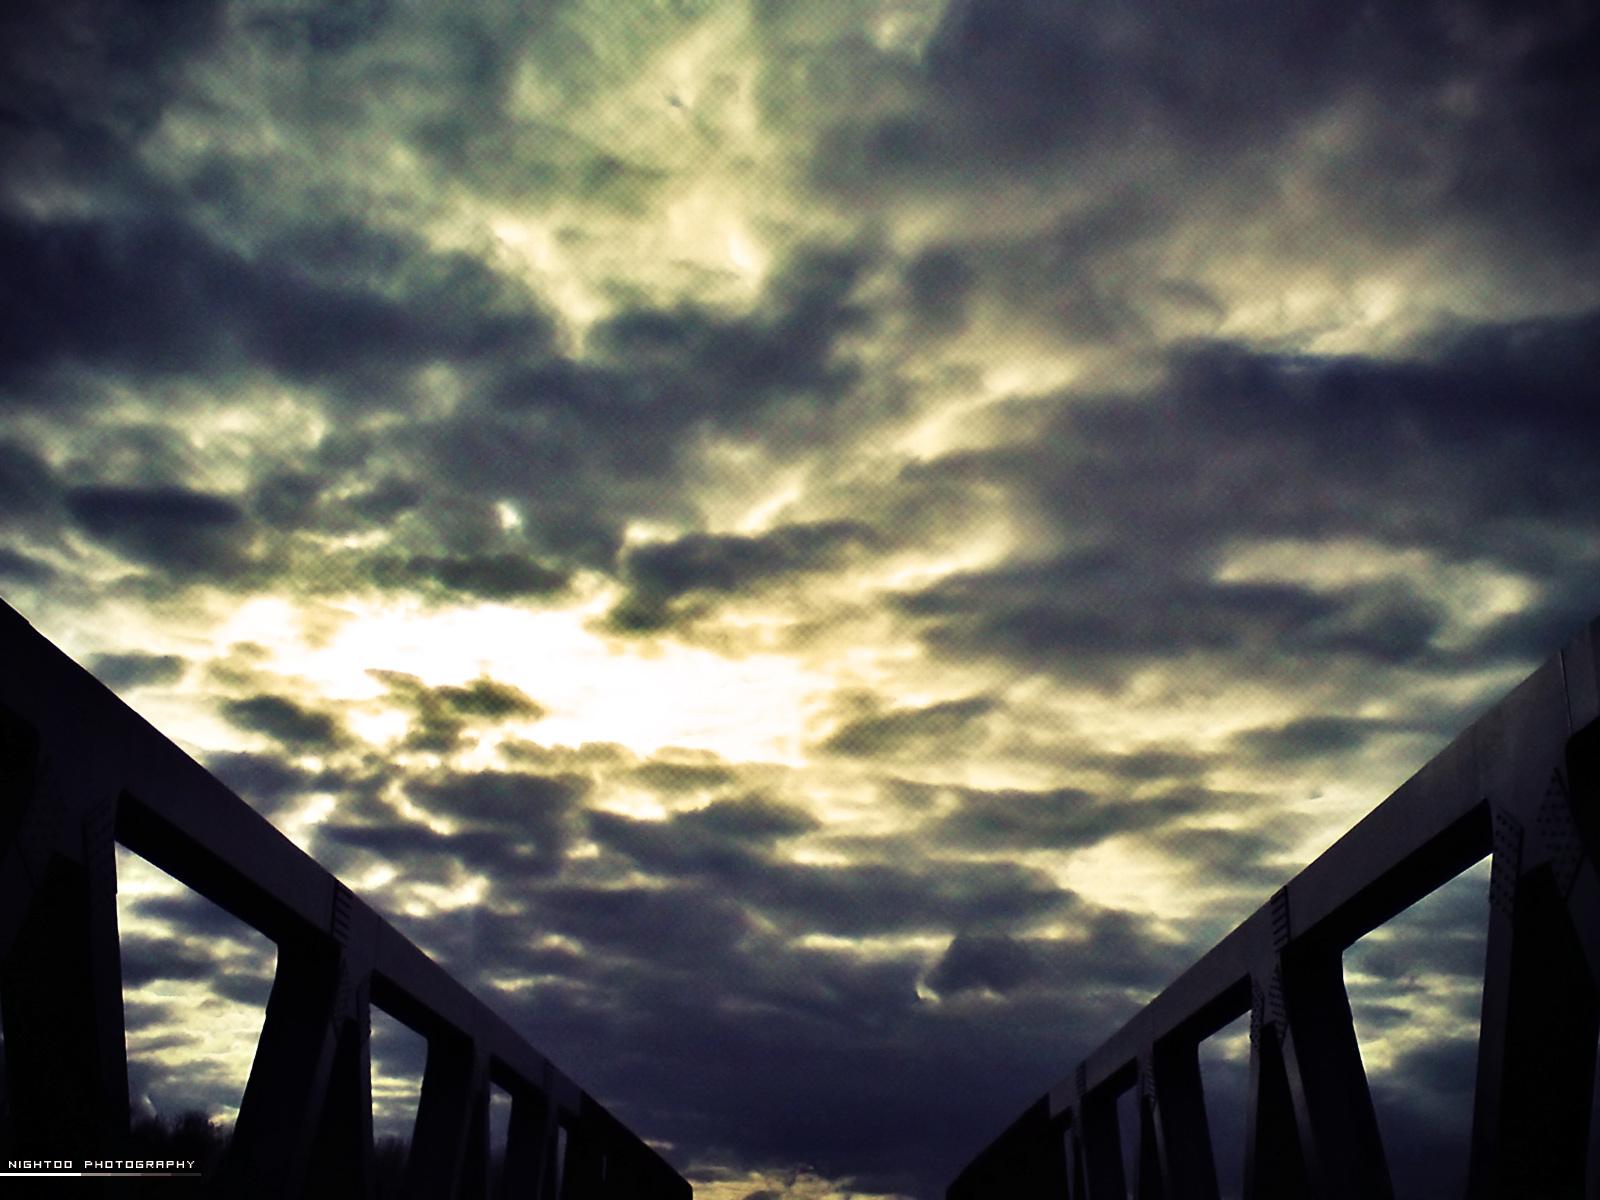 Wallpapers Constructions and architecture Bridges - Aqueduct Bridge of heaven